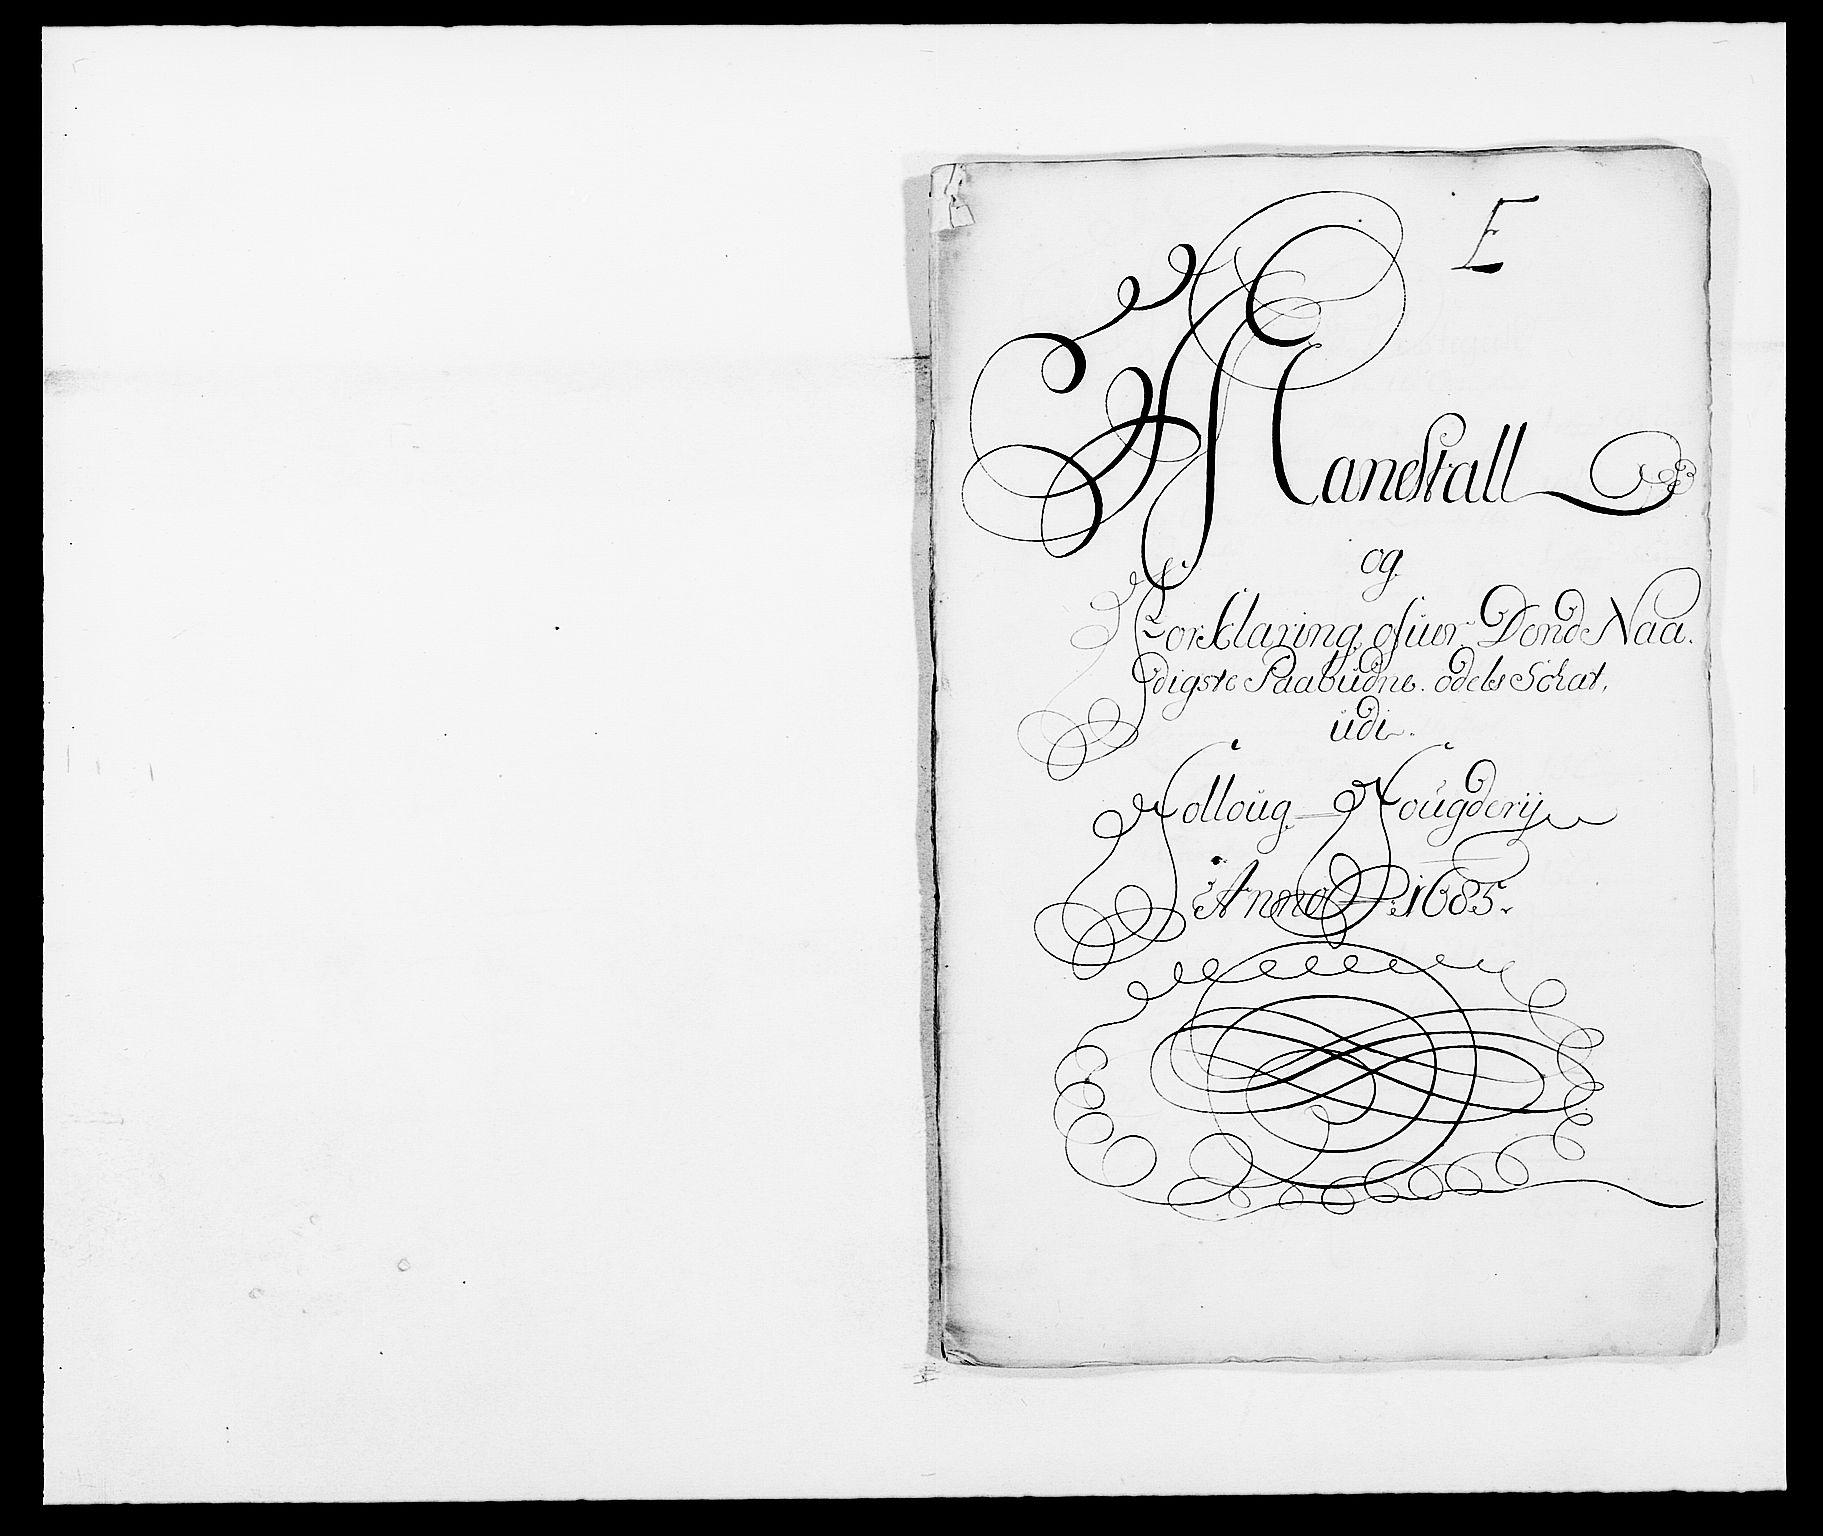 RA, Rentekammeret inntil 1814, Reviderte regnskaper, Fogderegnskap, R09/L0433: Fogderegnskap Follo, 1685-1686, s. 148